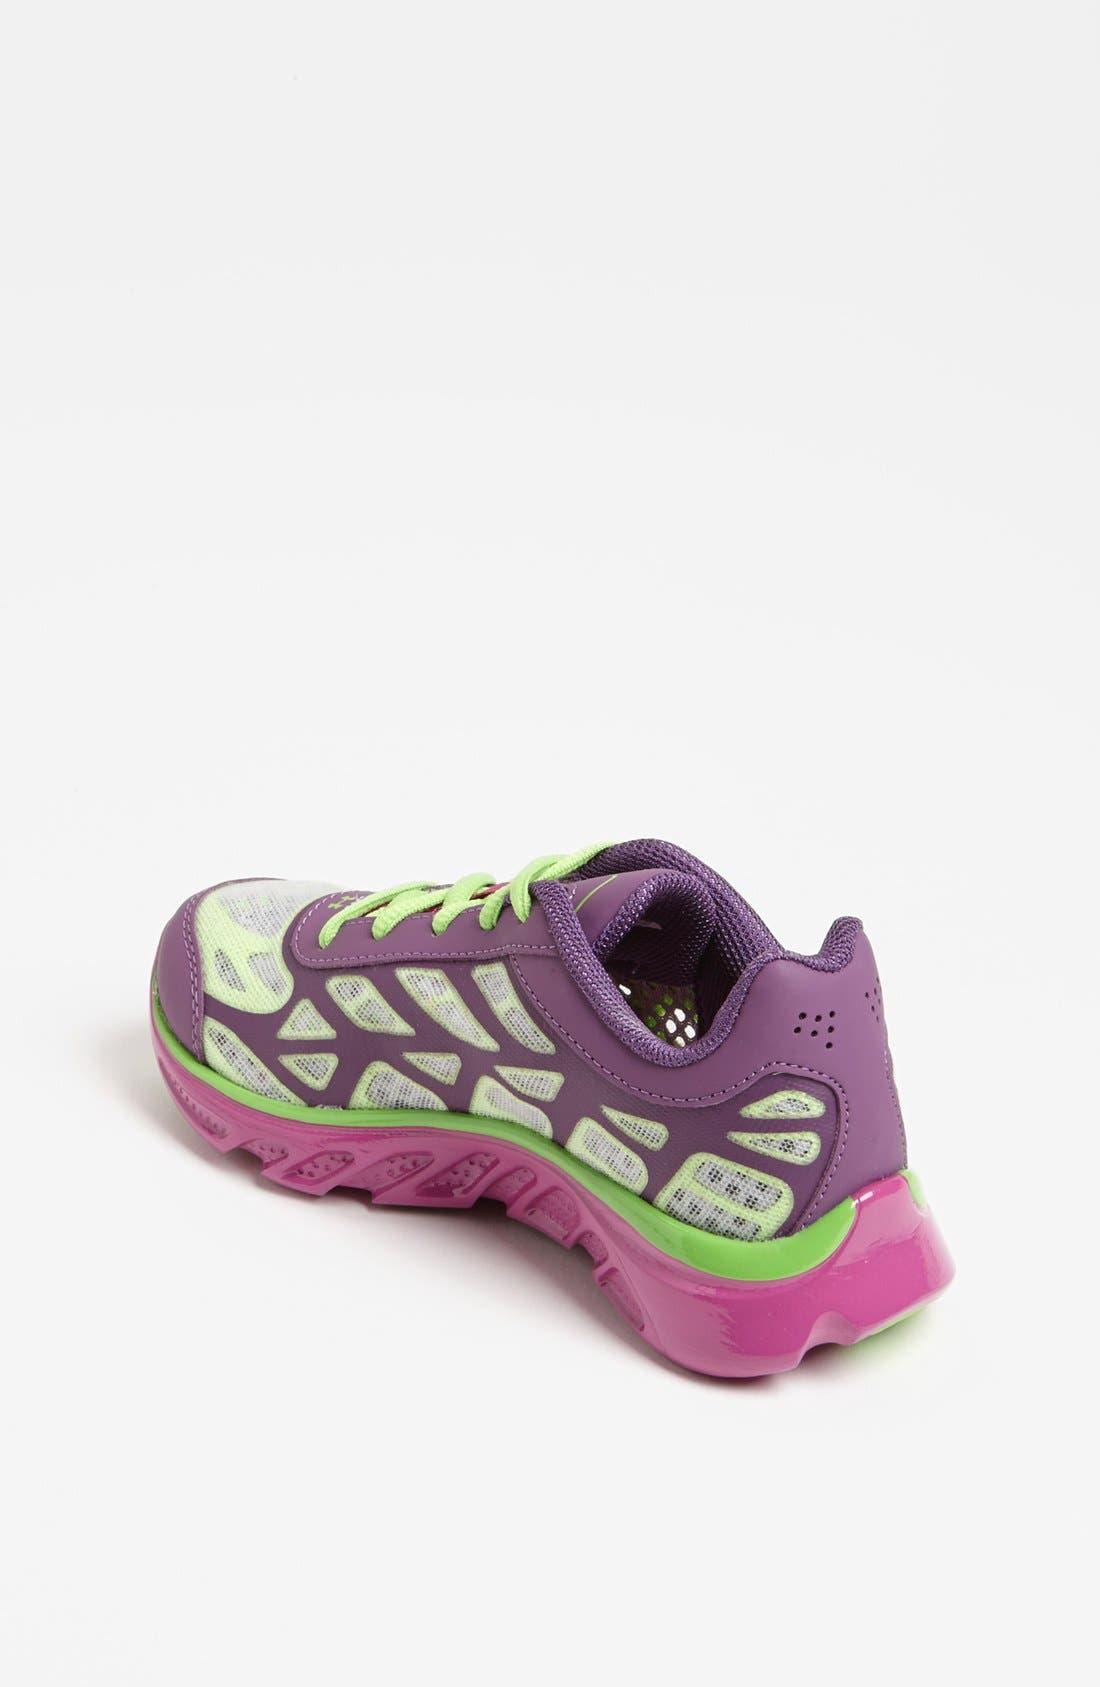 Alternate Image 2  - Under Armour 'Spine™ Vice' Athletic Shoe (Toddler, Little Kid & Big Kid)